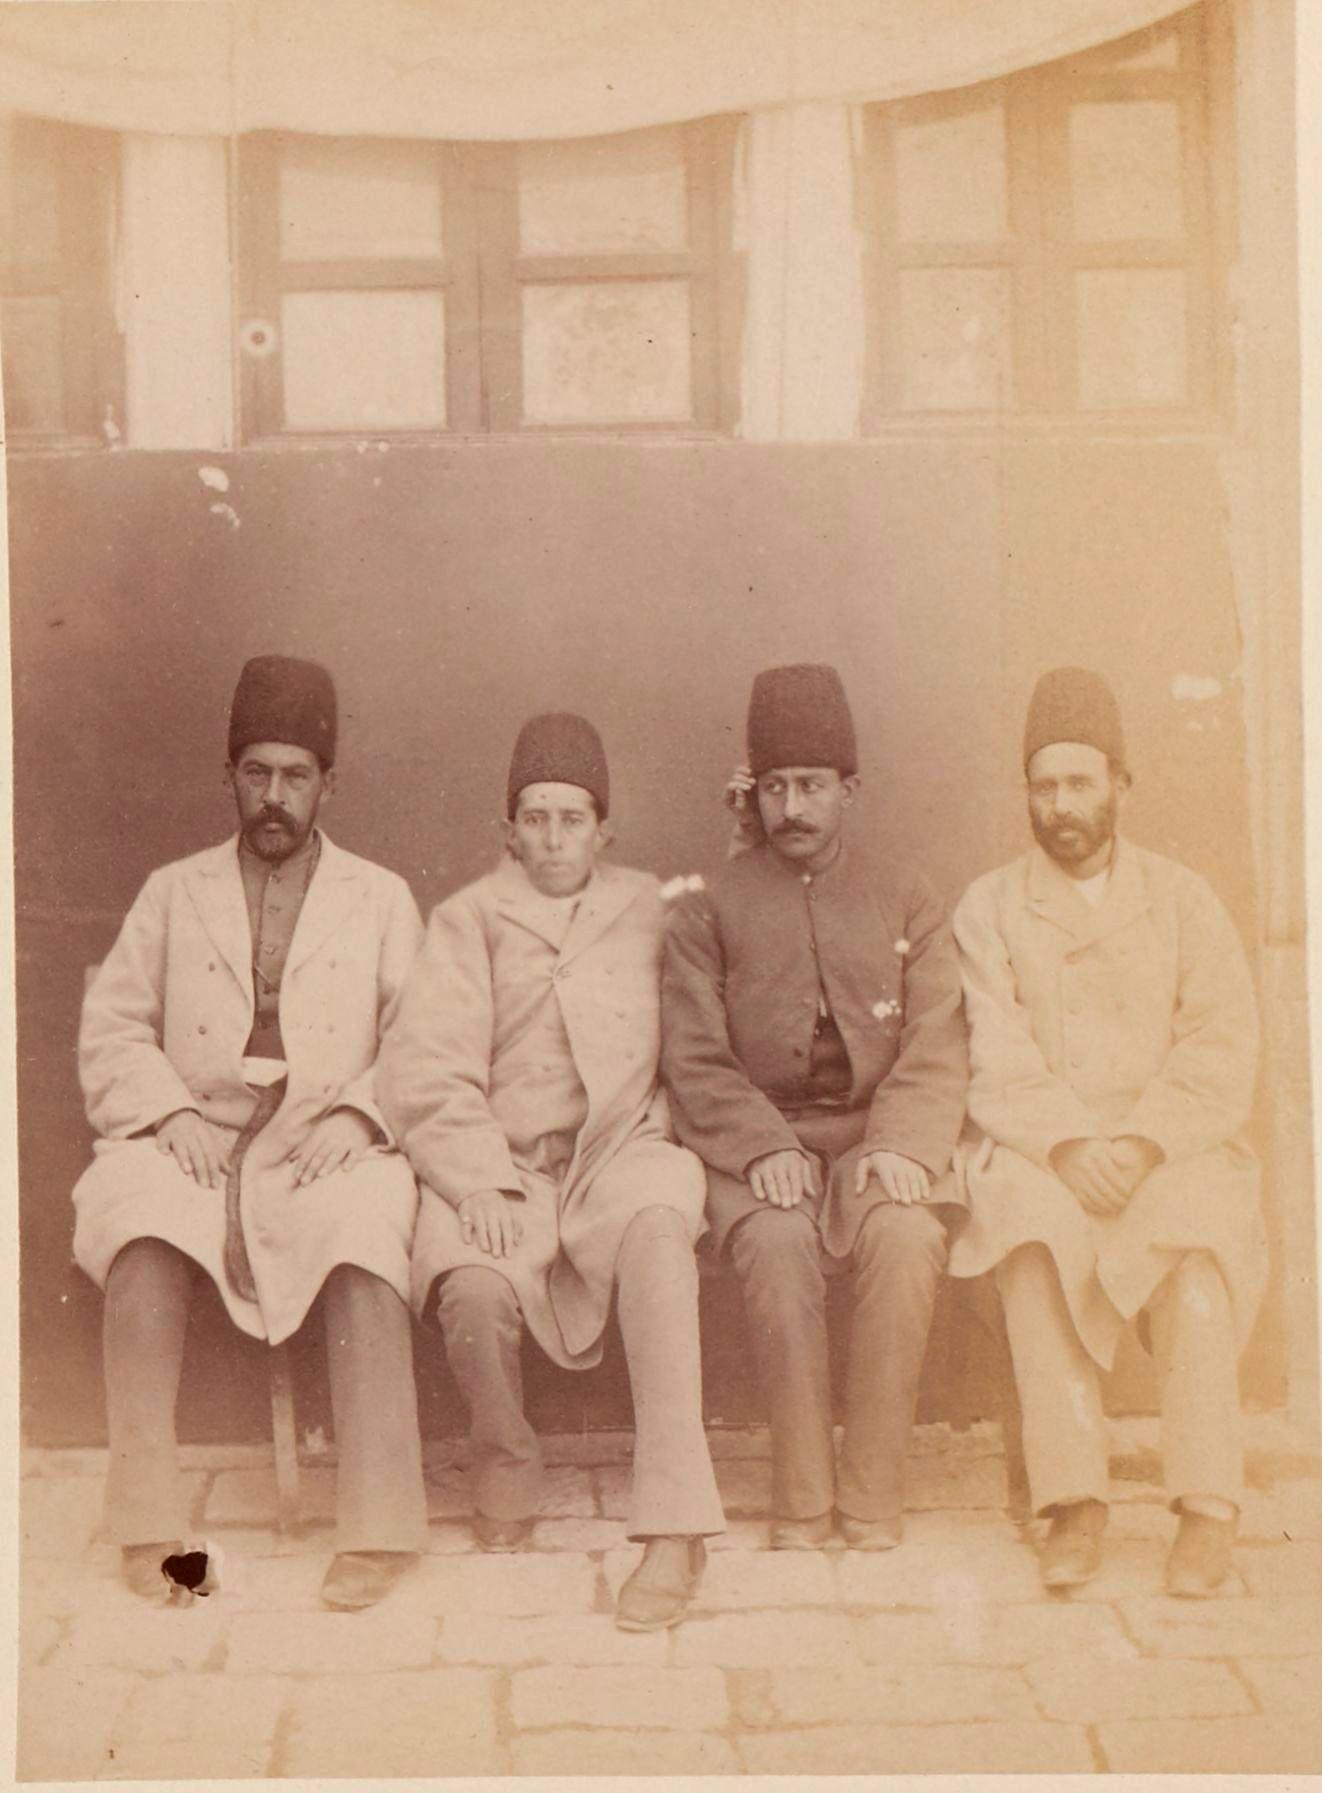 Абдул-Хоссейн Мирза Фарманфарма(30 марта, 1857 — 15 апреля 1939) — визирь Персии при Султан Ахмад-ша